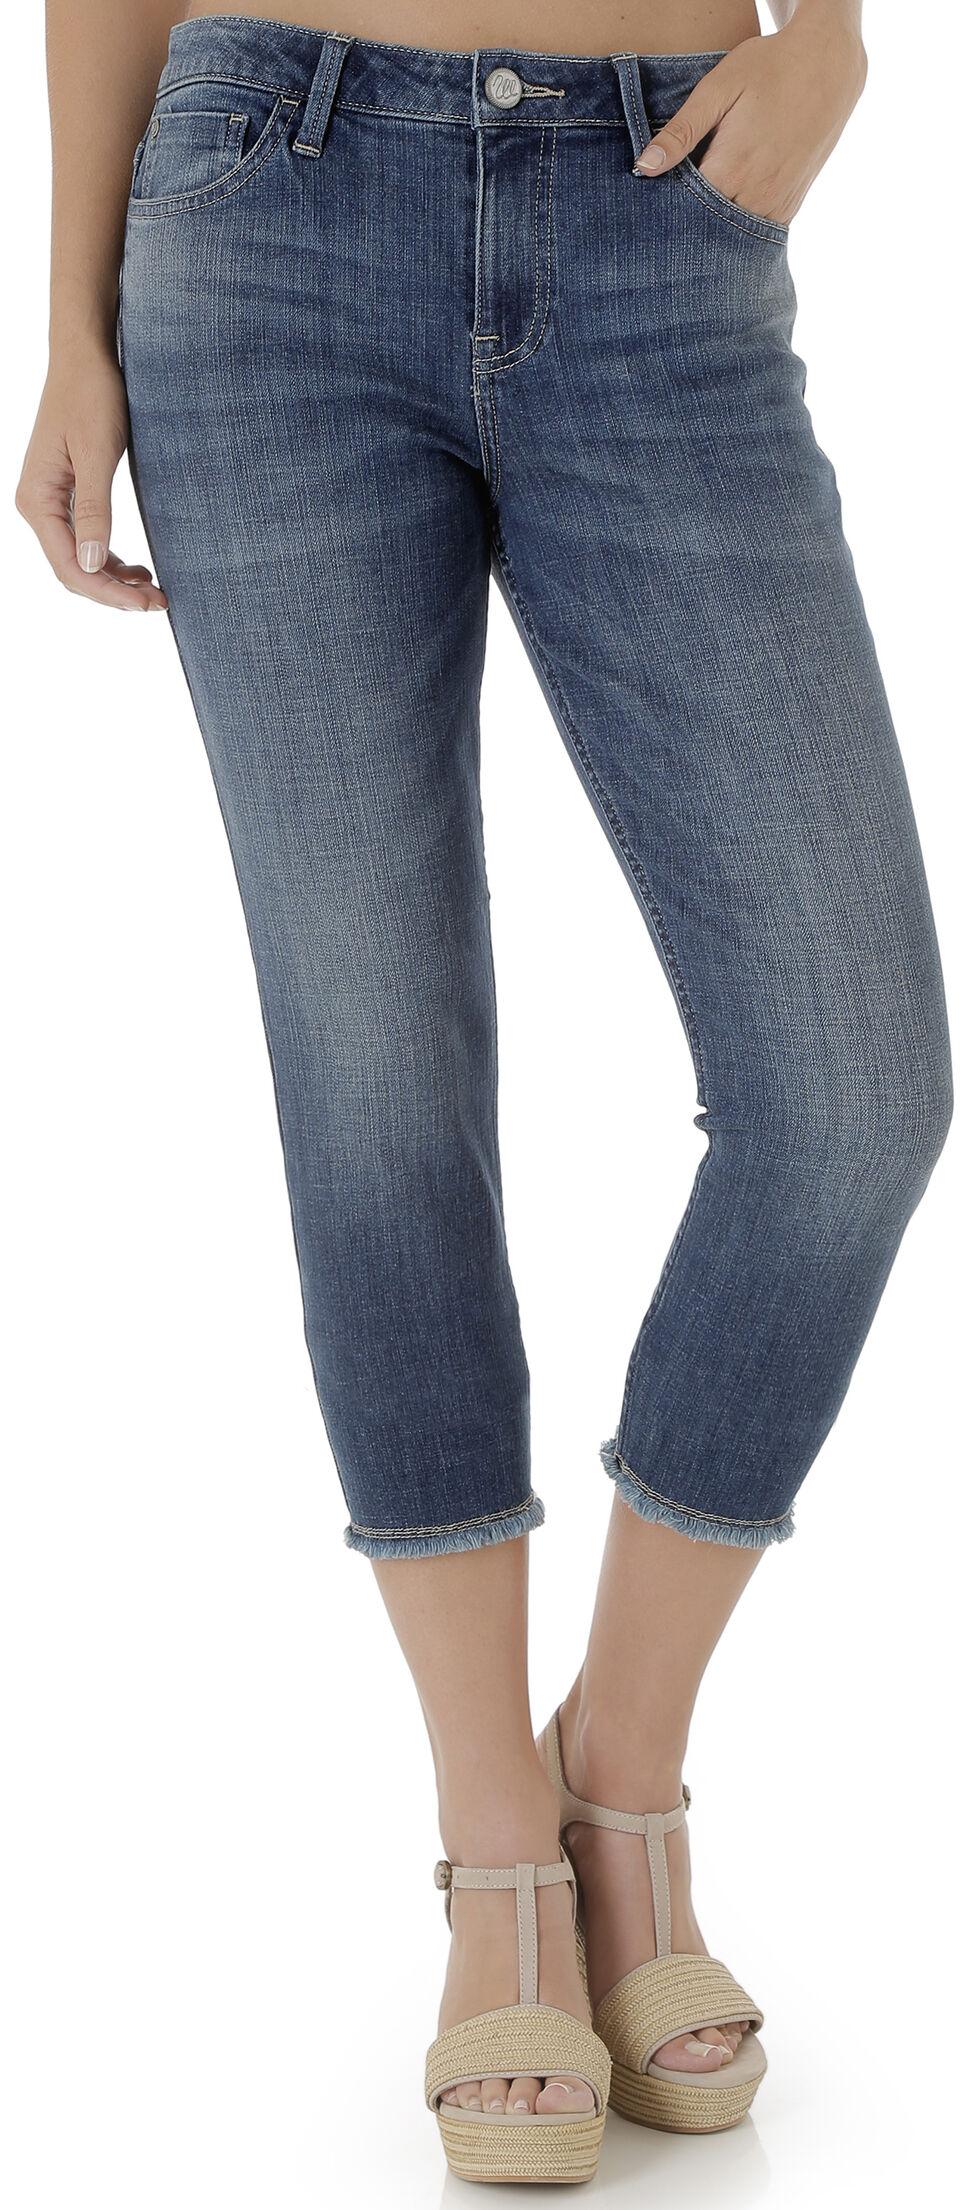 Wrangler Women's Retro Crop Skinny Jeans , Indigo, hi-res